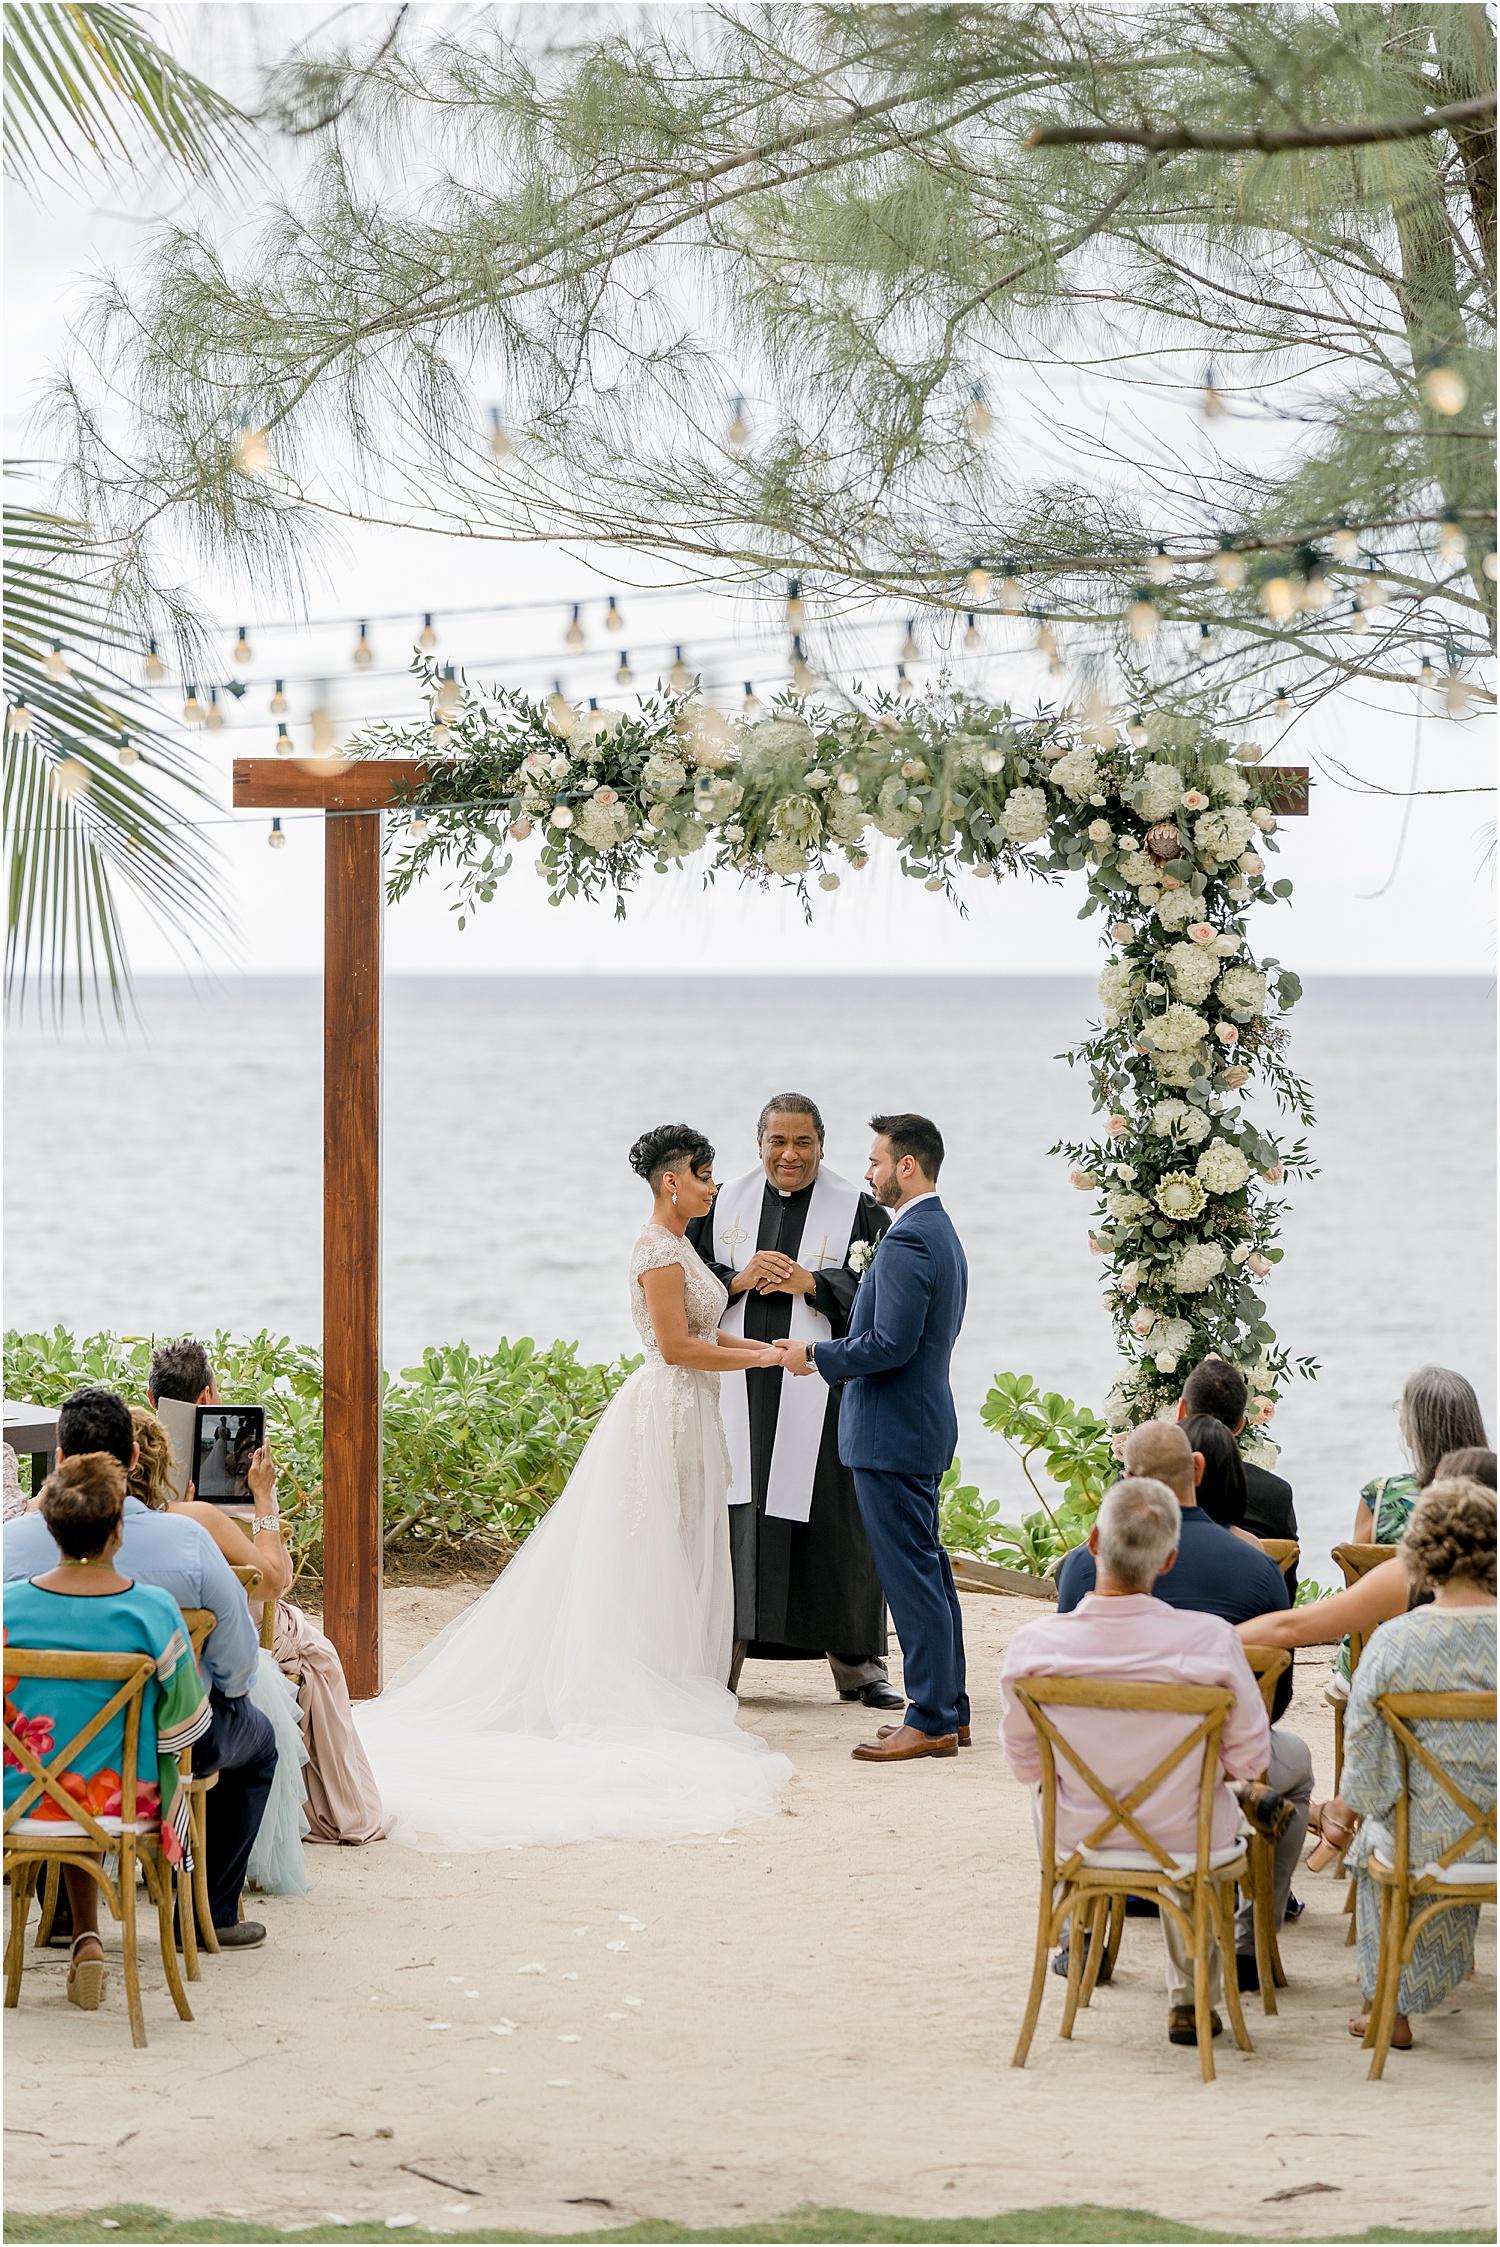 Sea Orchard Retreat wedding